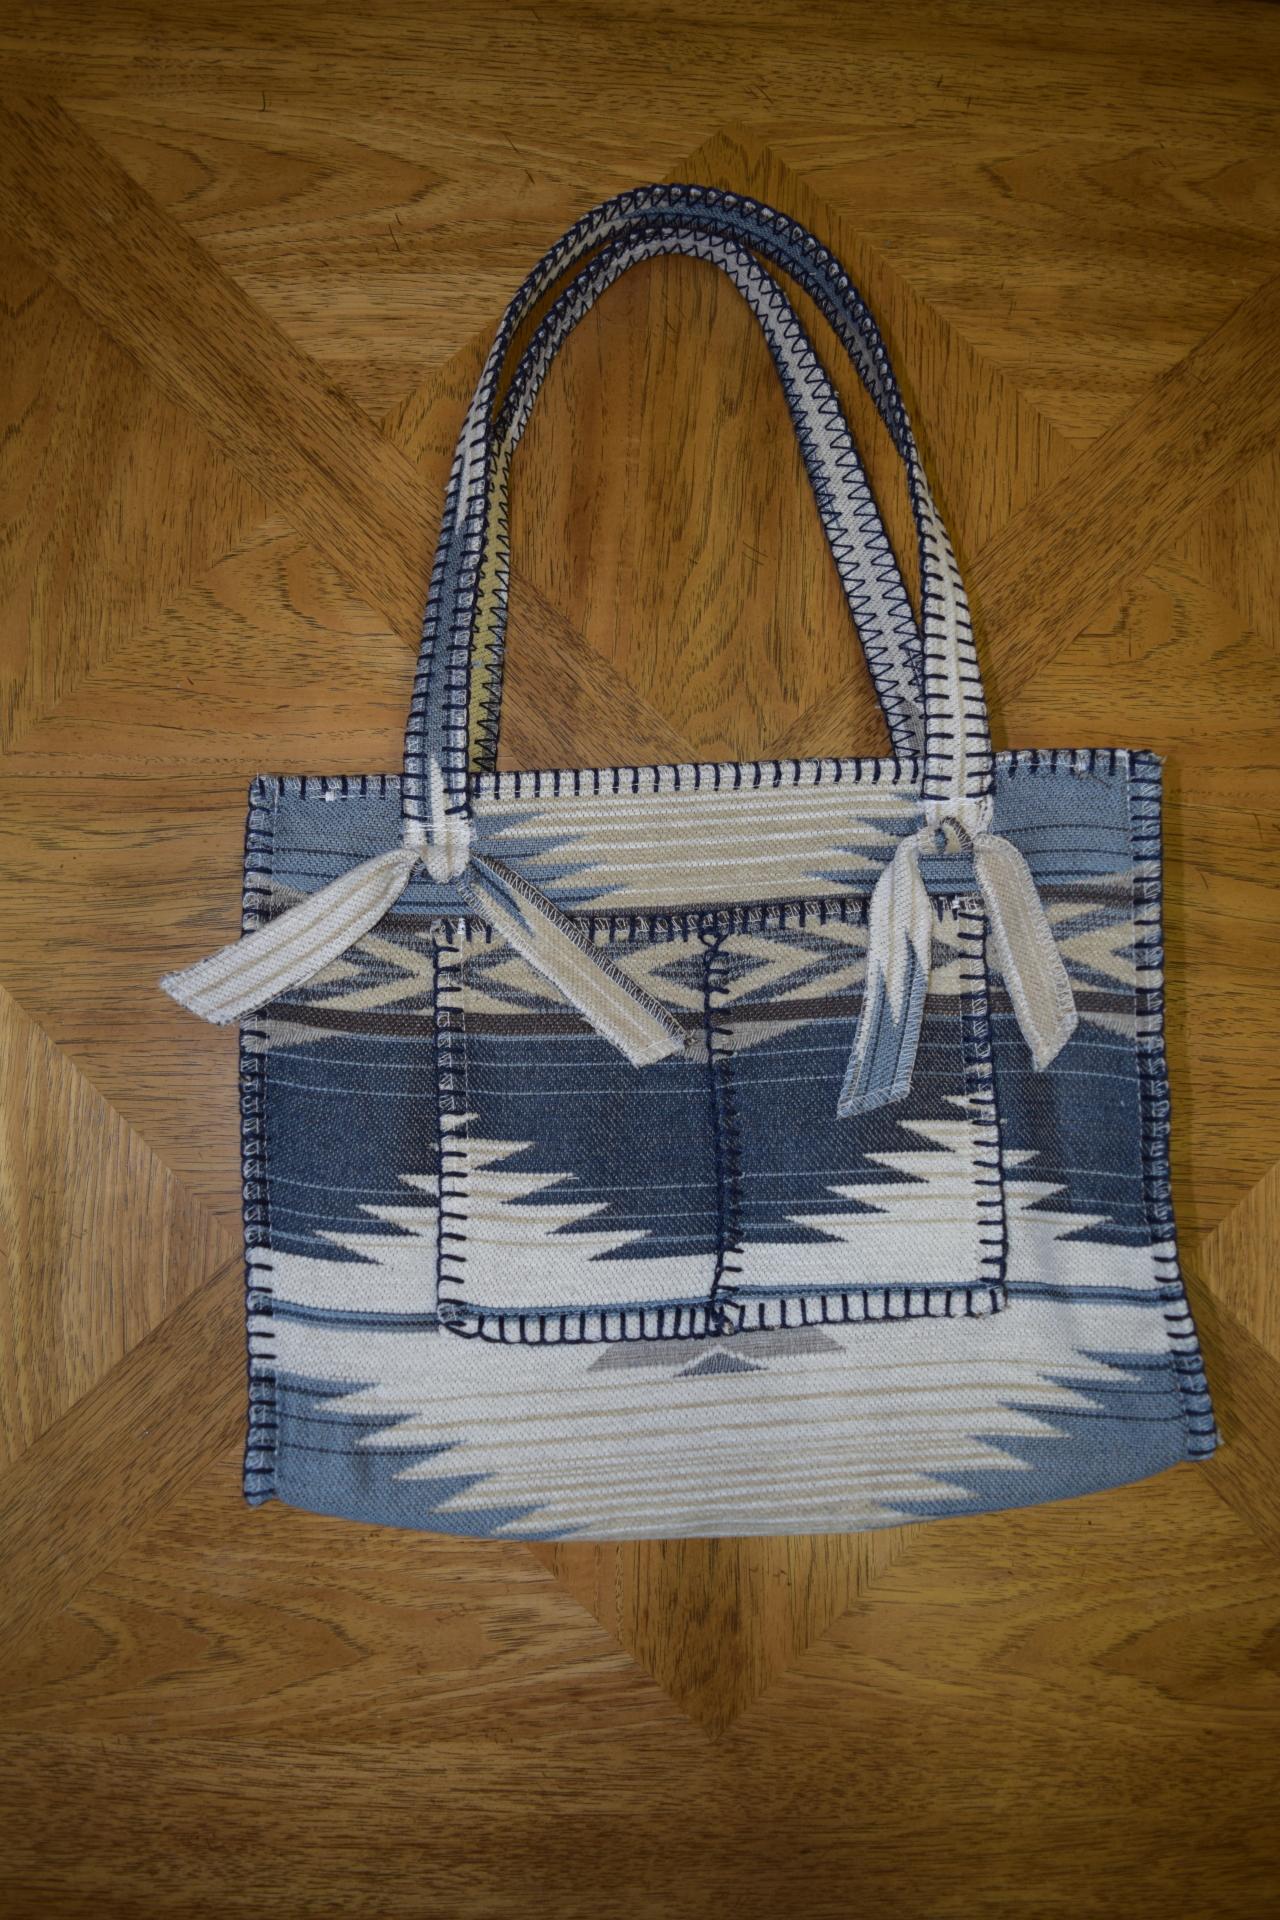 #B10TBB - BLUE THUNDERBIRD POCKET ZIP BAG - $99.95